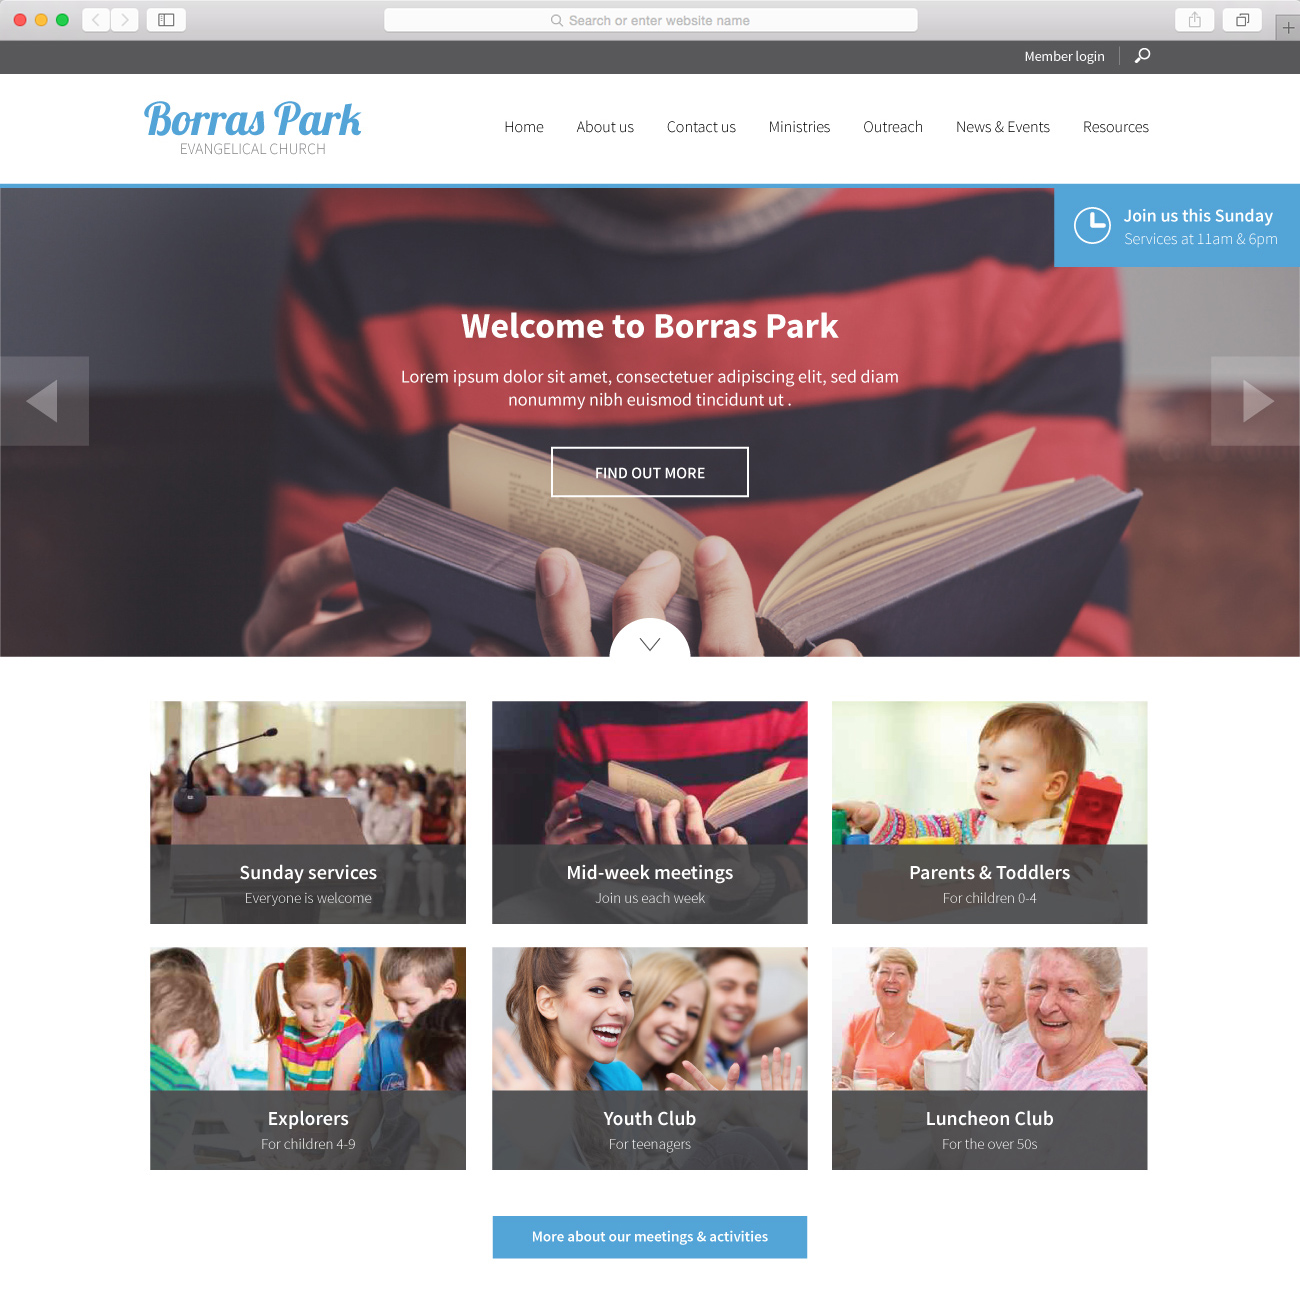 Borras Park Evangelical Church